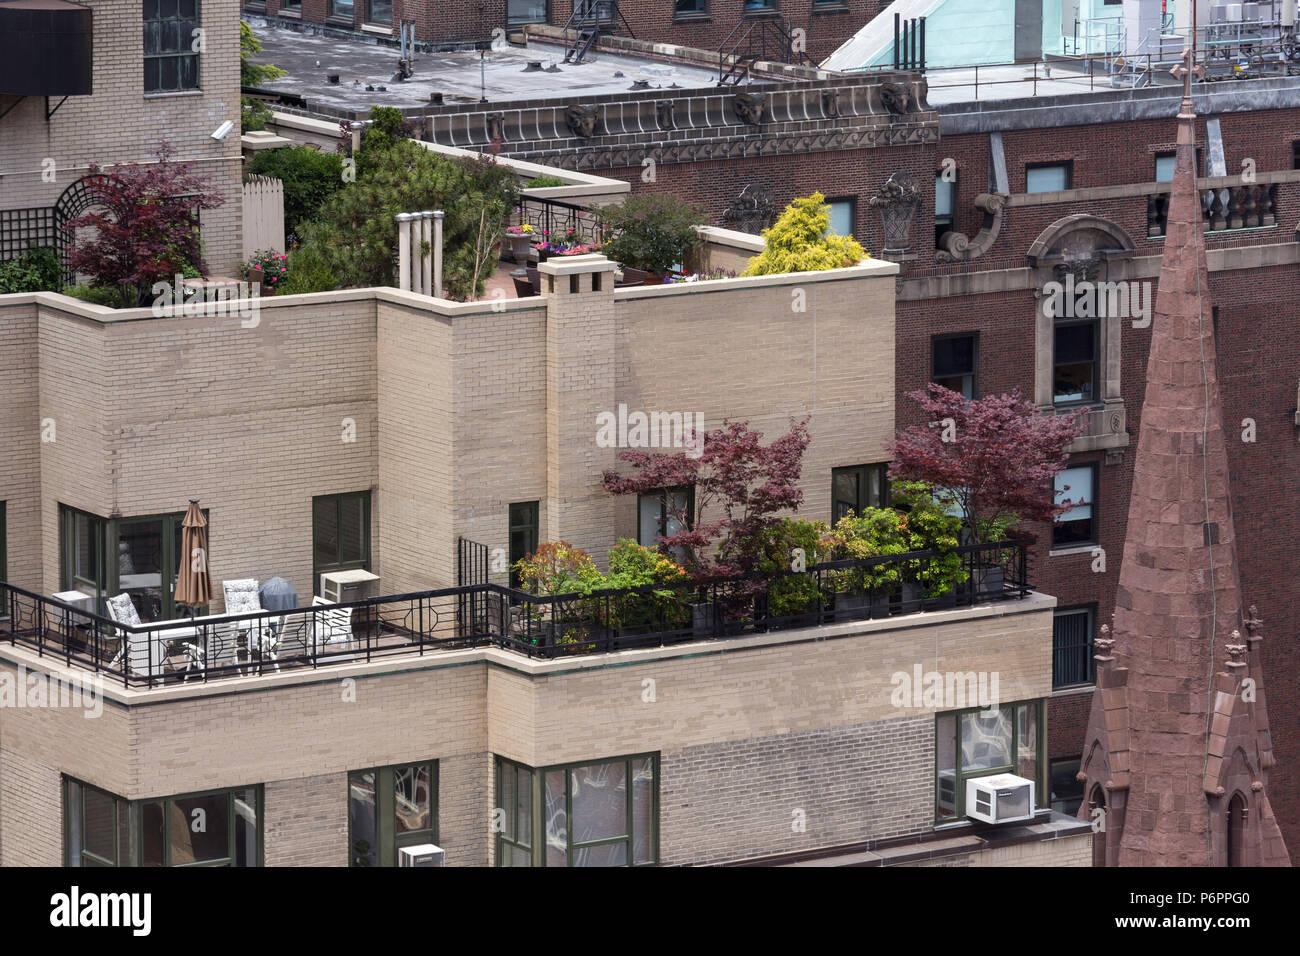 Balcony garden, Midtown Manhattan Apartment Building, NYC, USA - Stock Image